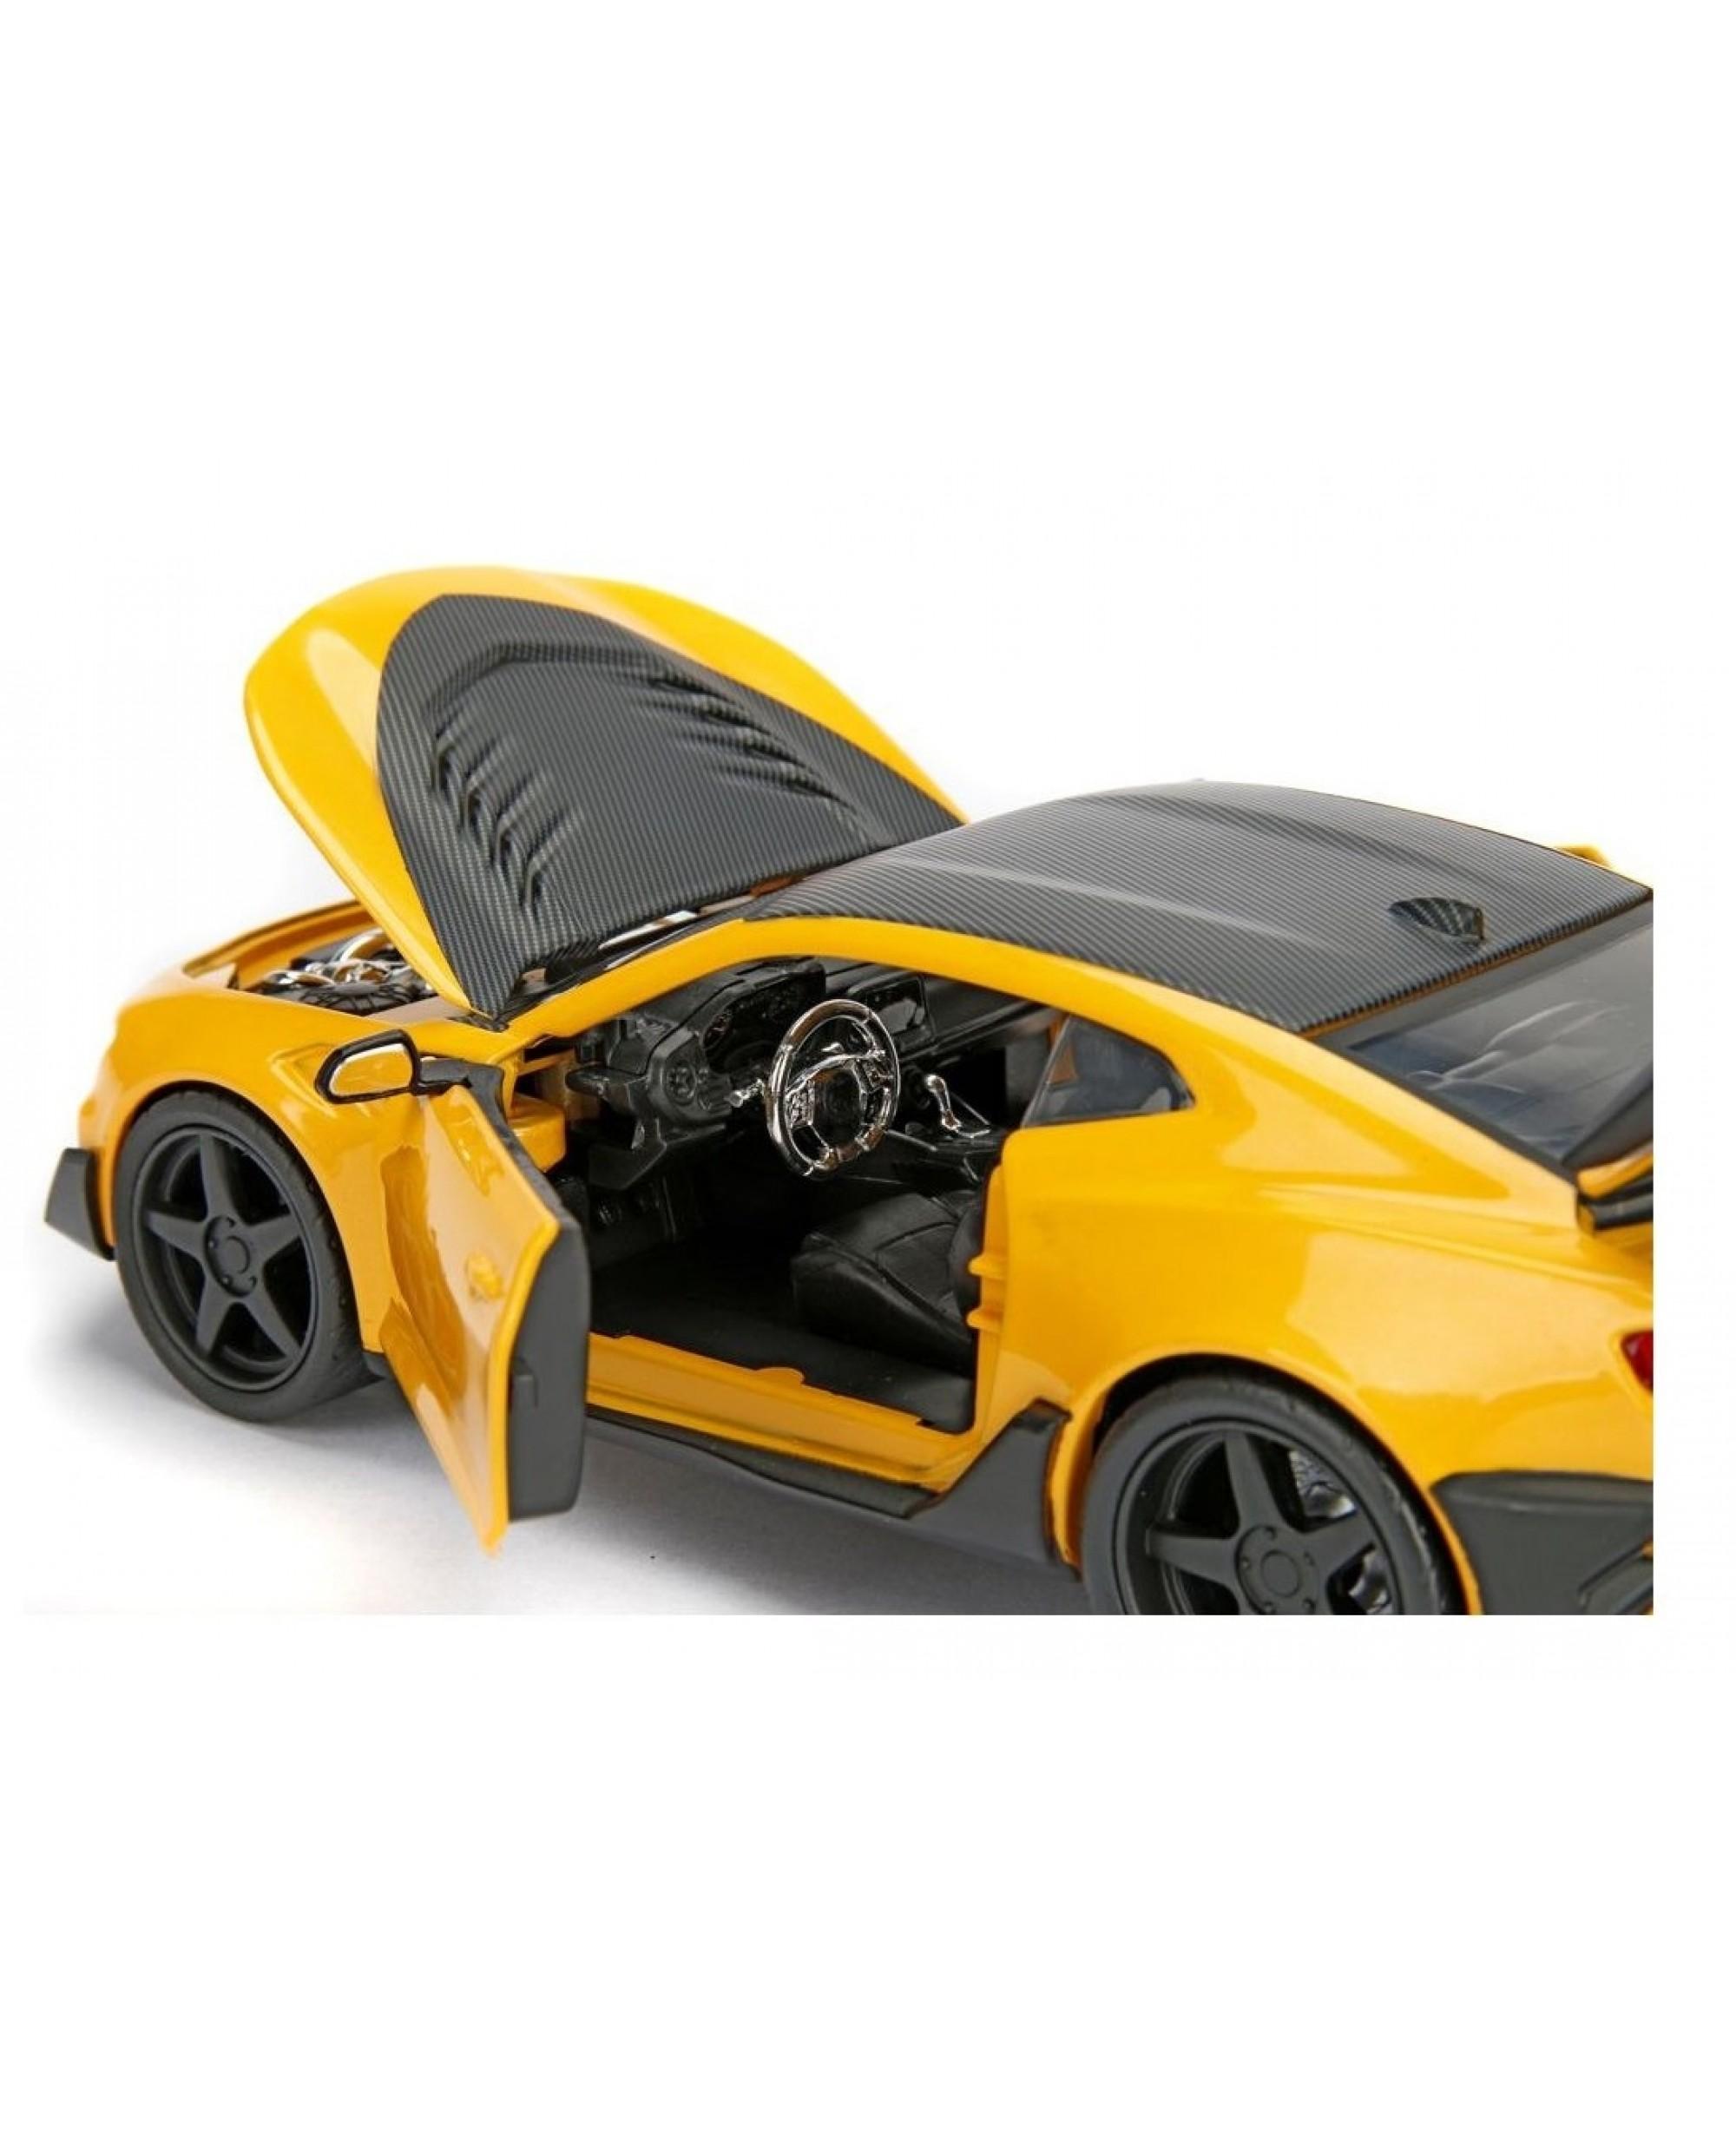 Masinuta - Chevrolet Camaro Bumblebee Yellow   Jada Toys - 3